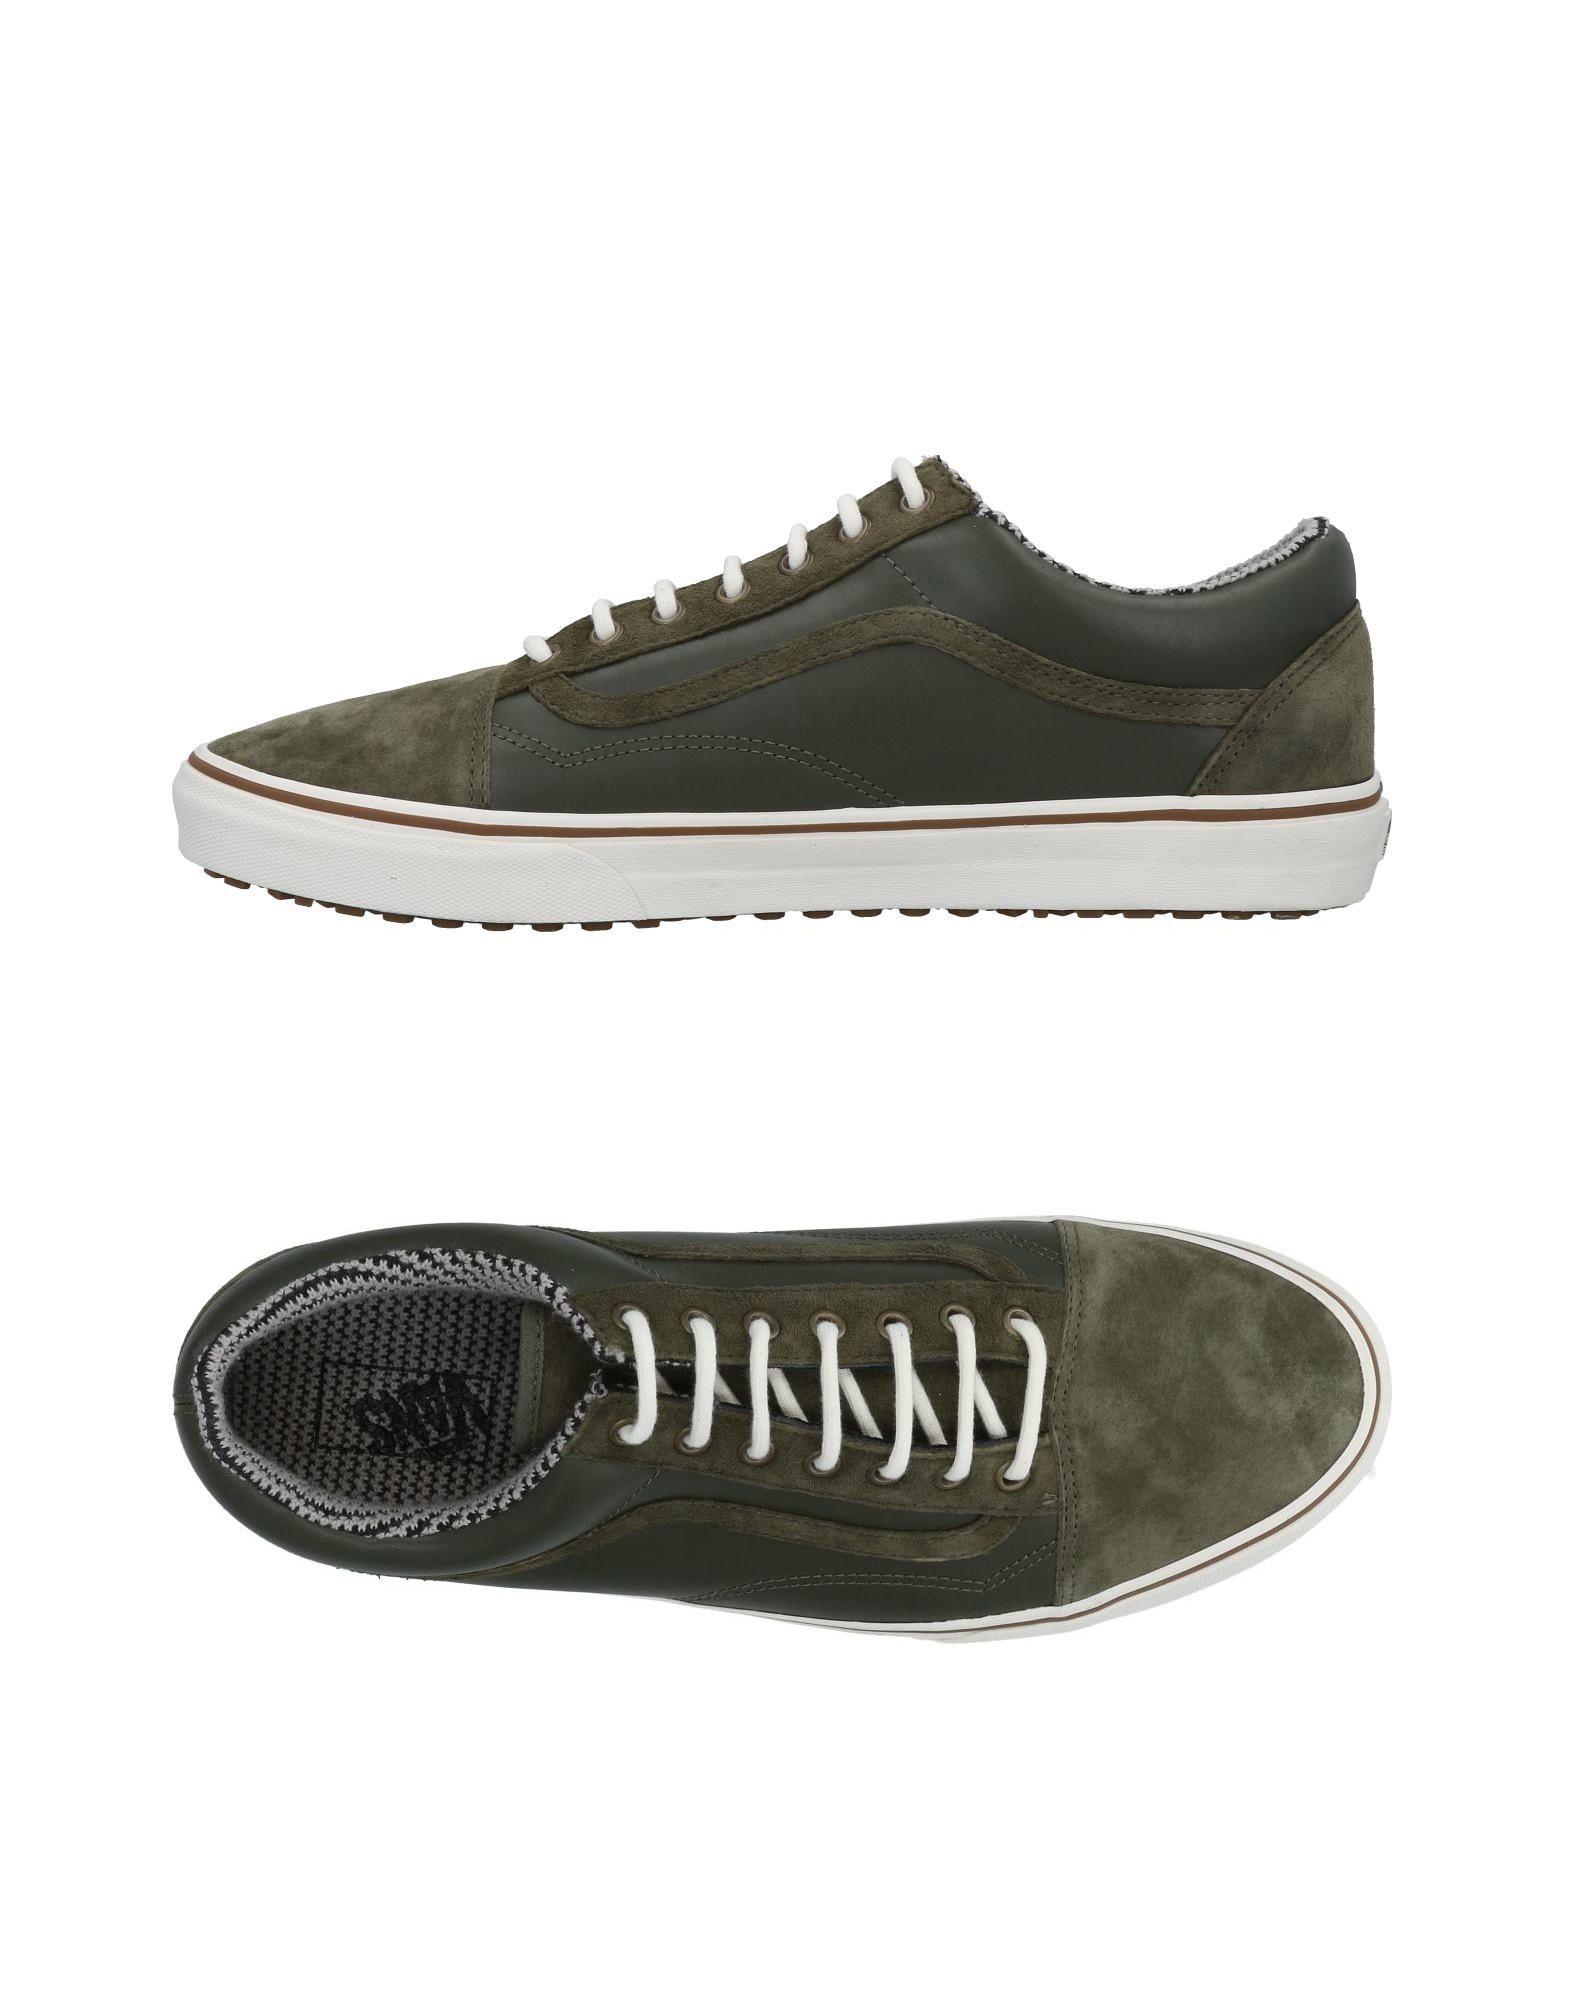 Moda Sneakers Vans Uomo - 11491775JA 11491775JA - 0579e1